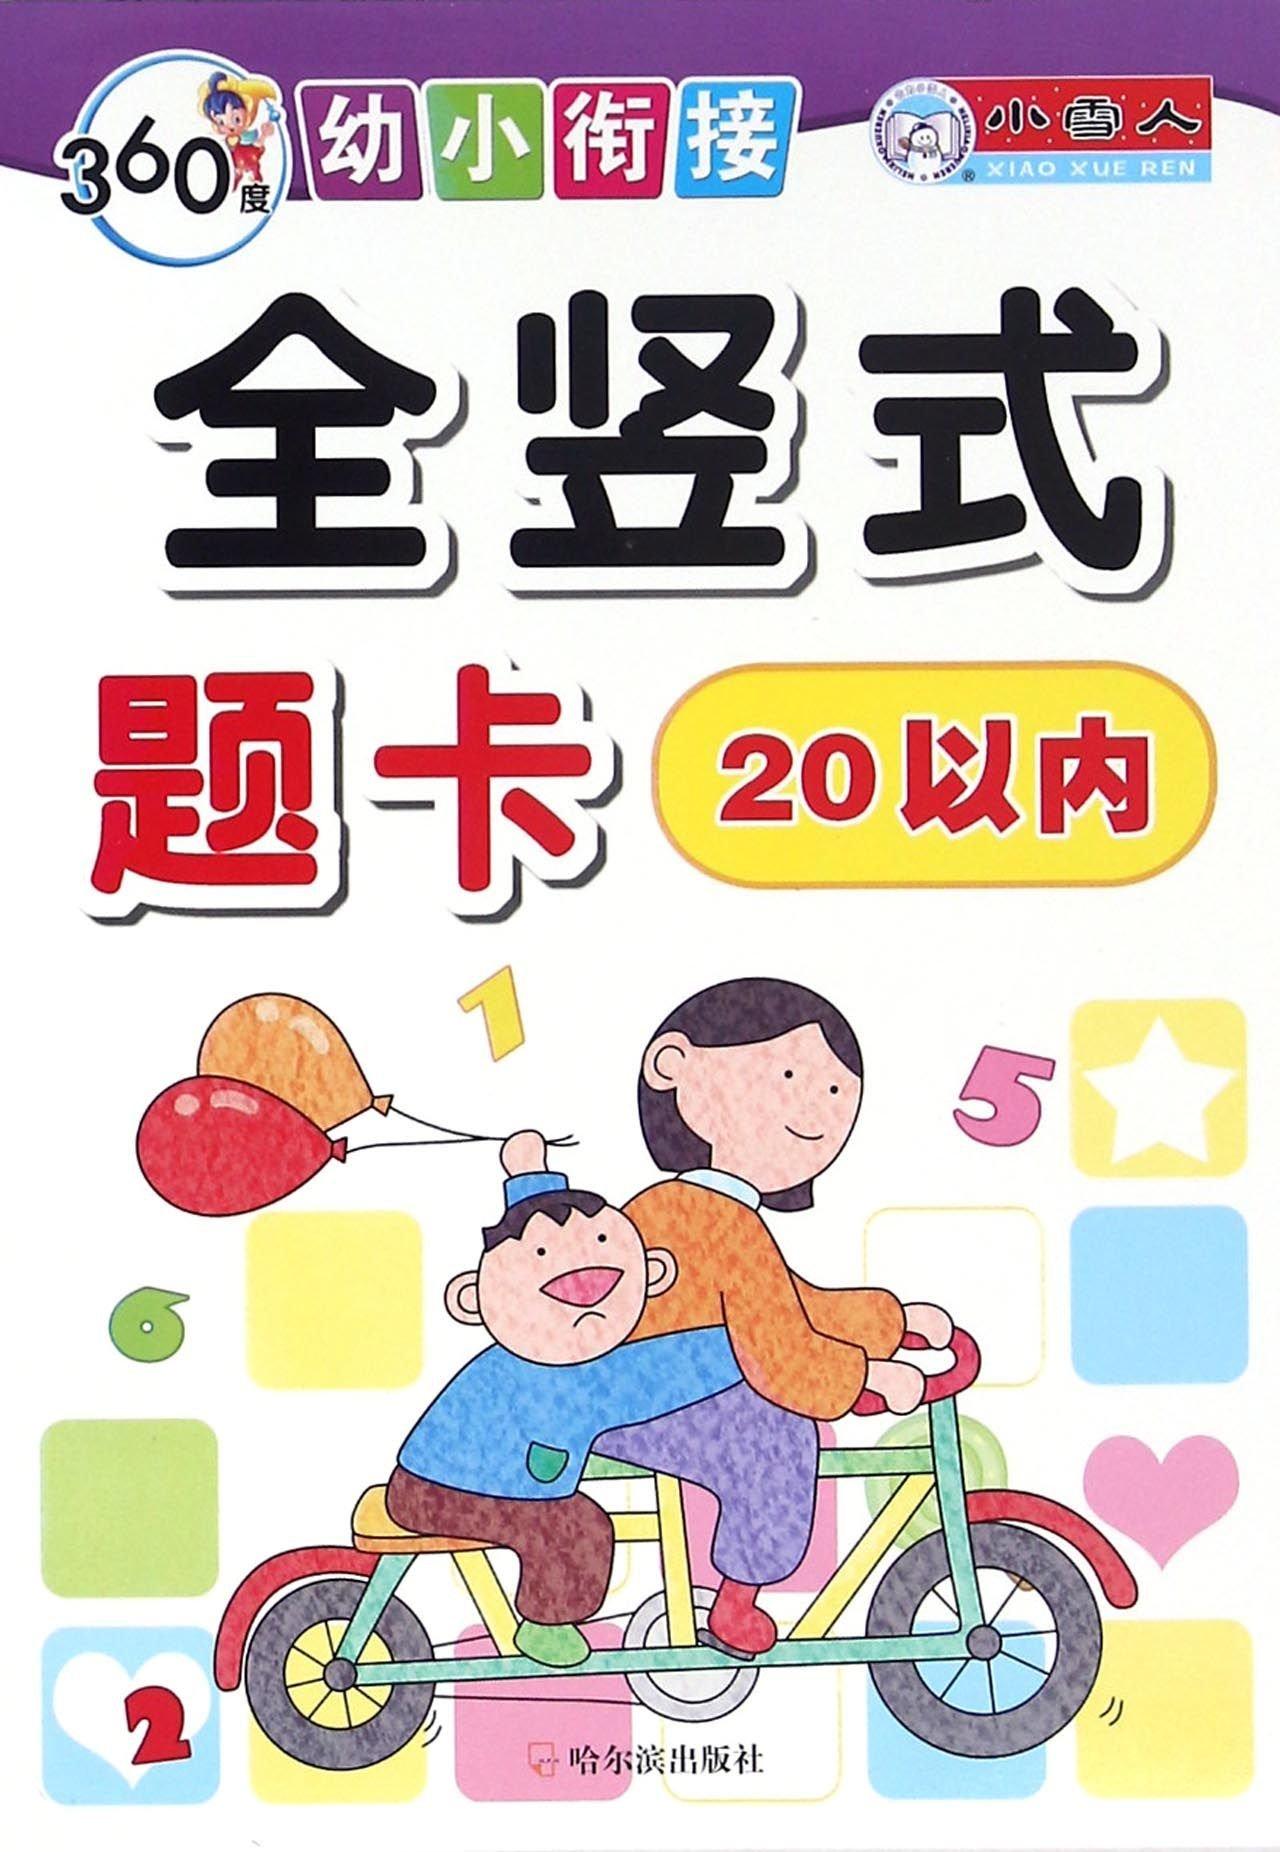 Download 全竖式题卡(20以内)/360度幼小衔接 ebook